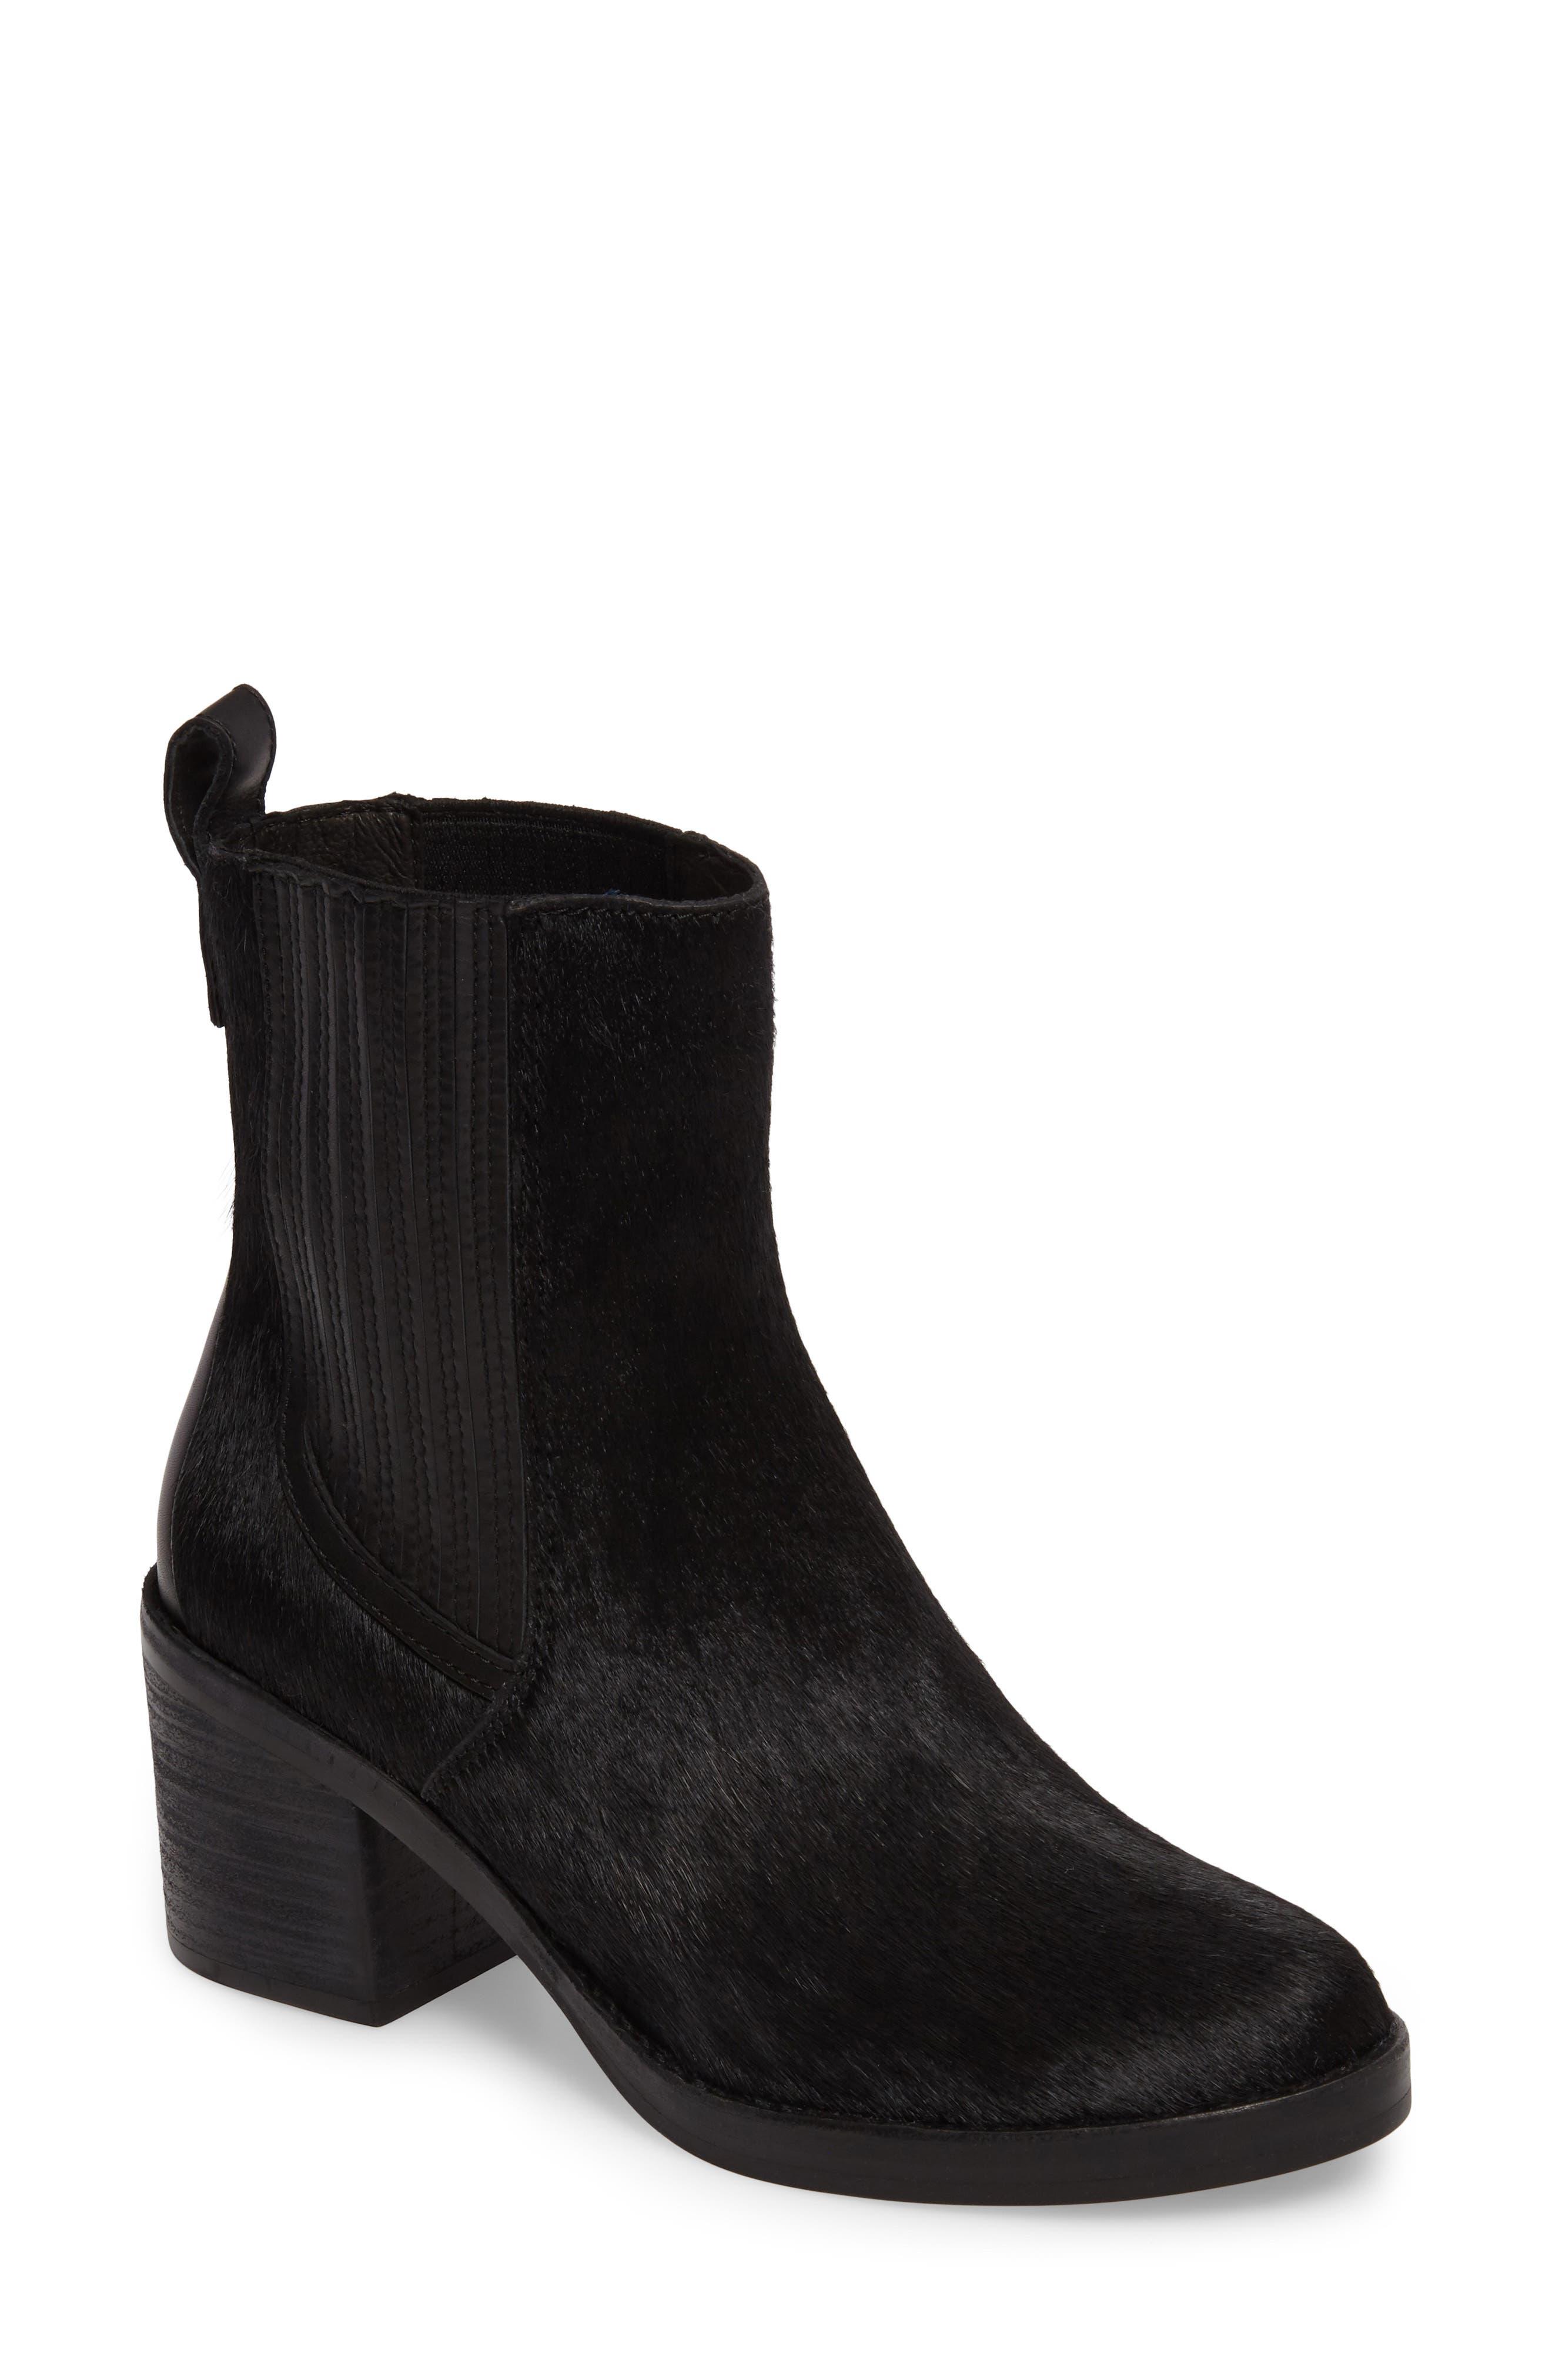 Camden Genuine Calf Hair Chelsea Boot,                             Main thumbnail 1, color,                             Black Calf Hair Leather